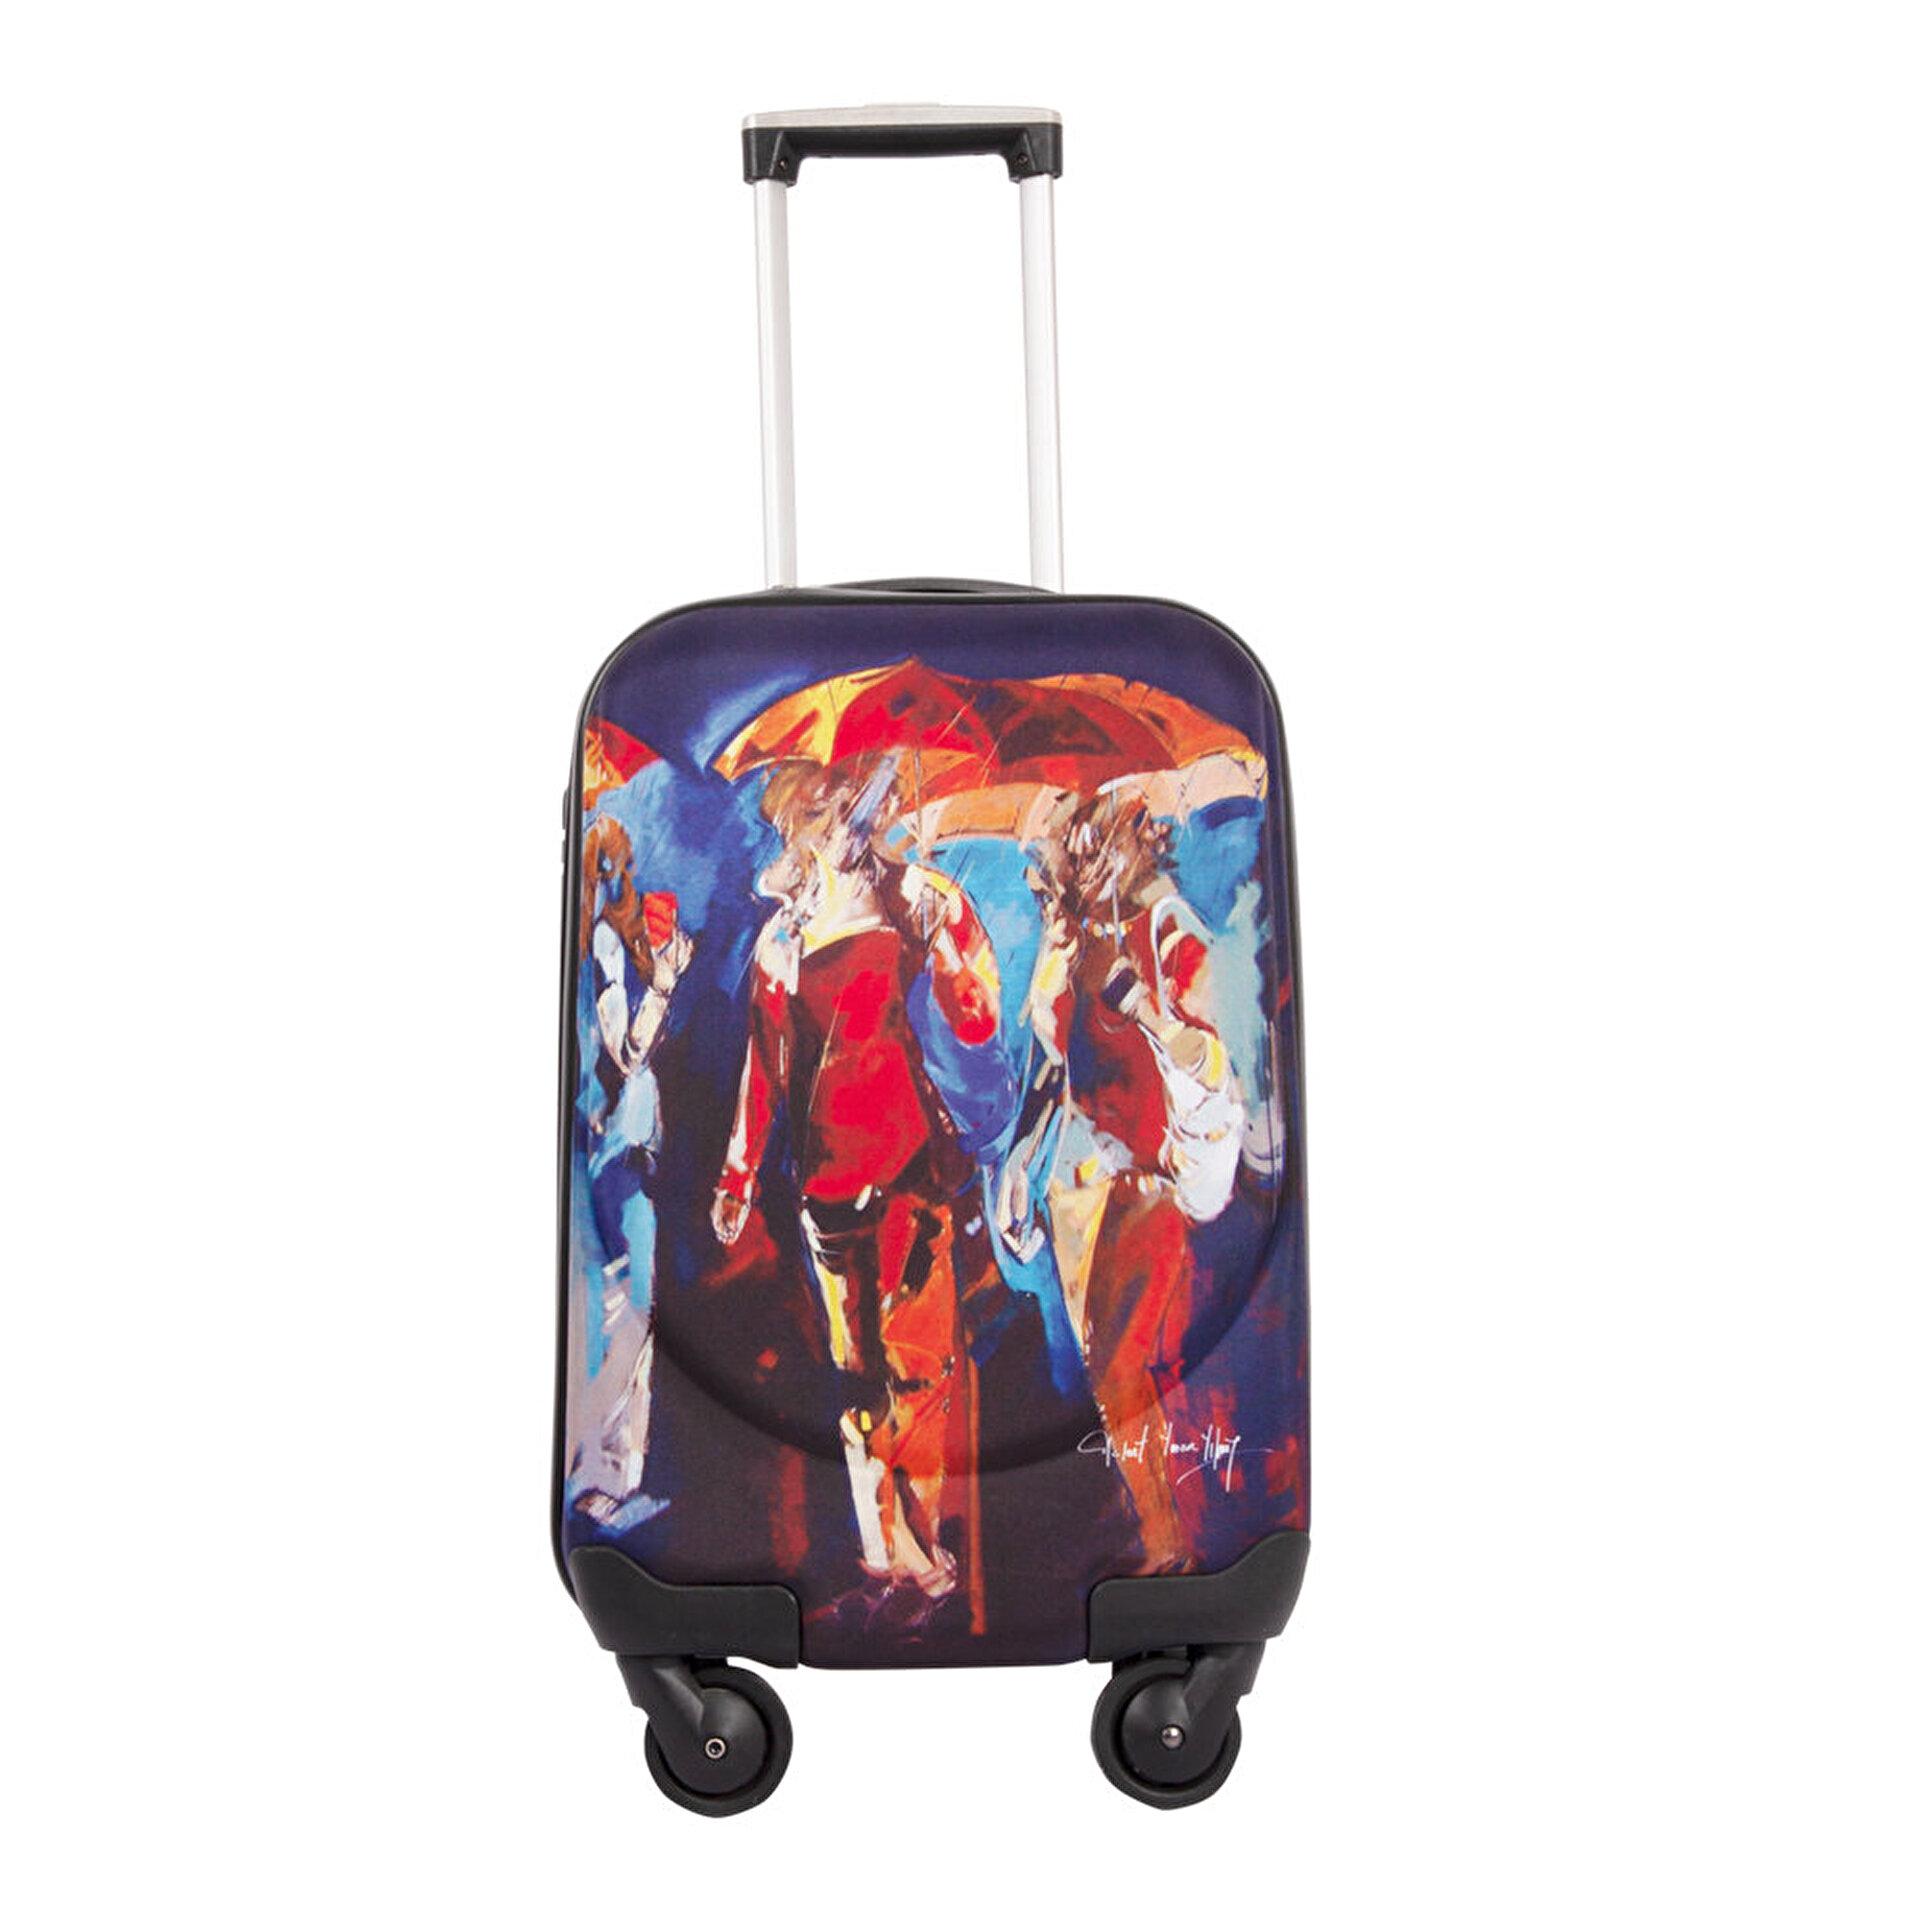 Picture of BiggDesign Şemsiyeler Kabin Boy Kanvas Valiz 18 inch